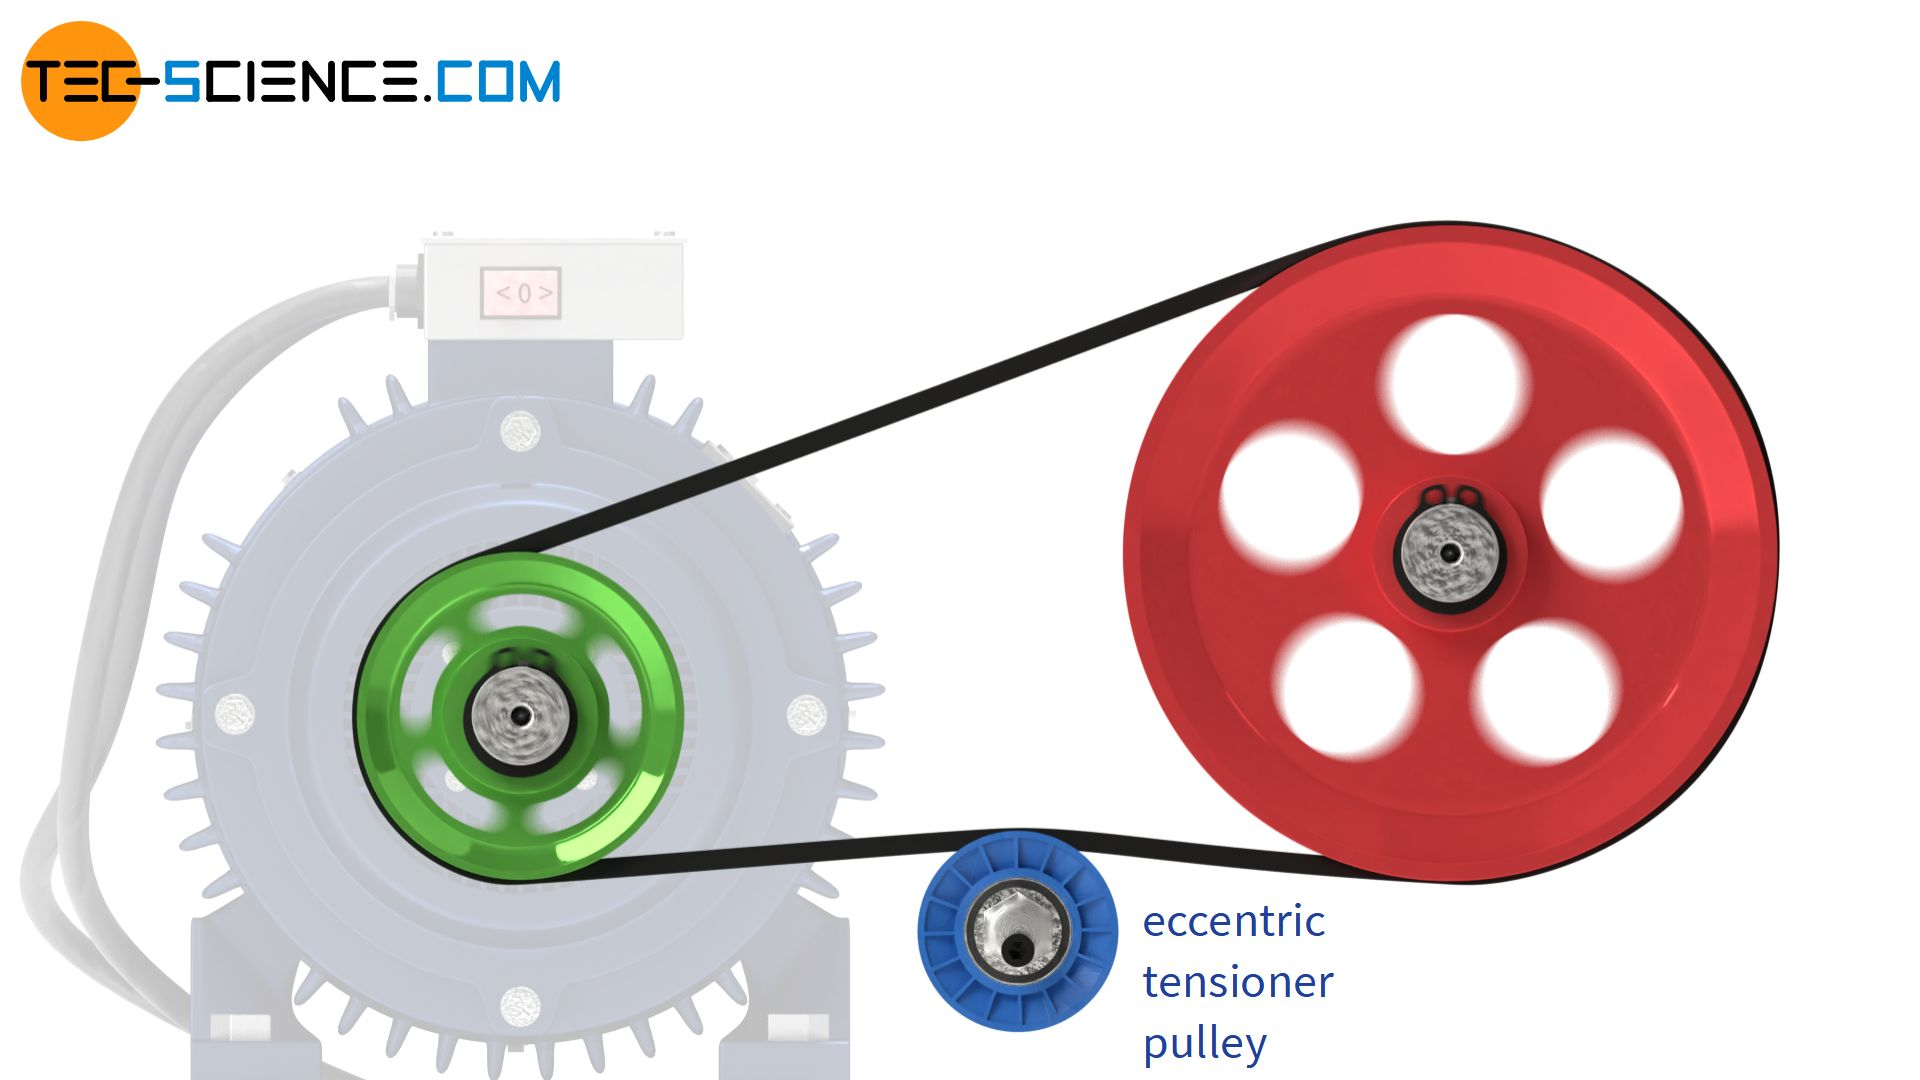 Eccentric tensioner pulley